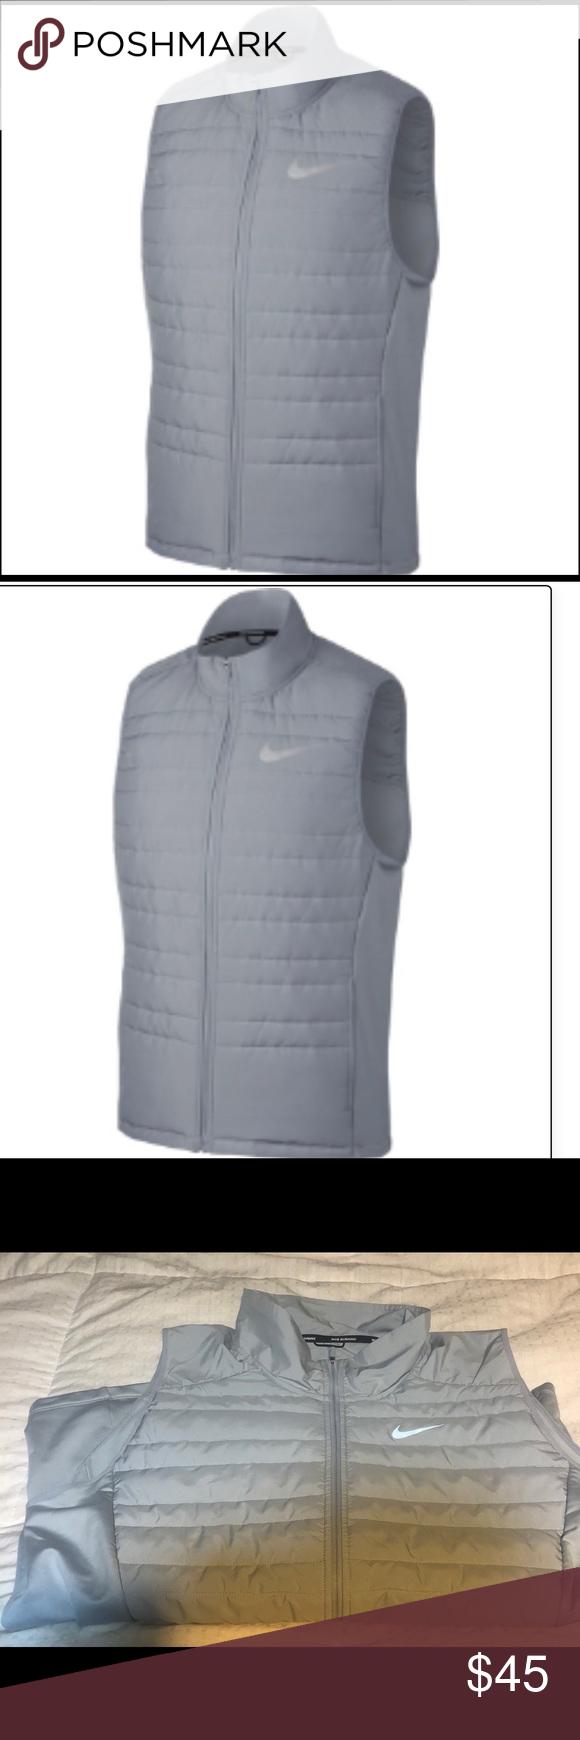 94509061f Men's Nike Essential Running Vest- looks new Men's Nike Essential ...